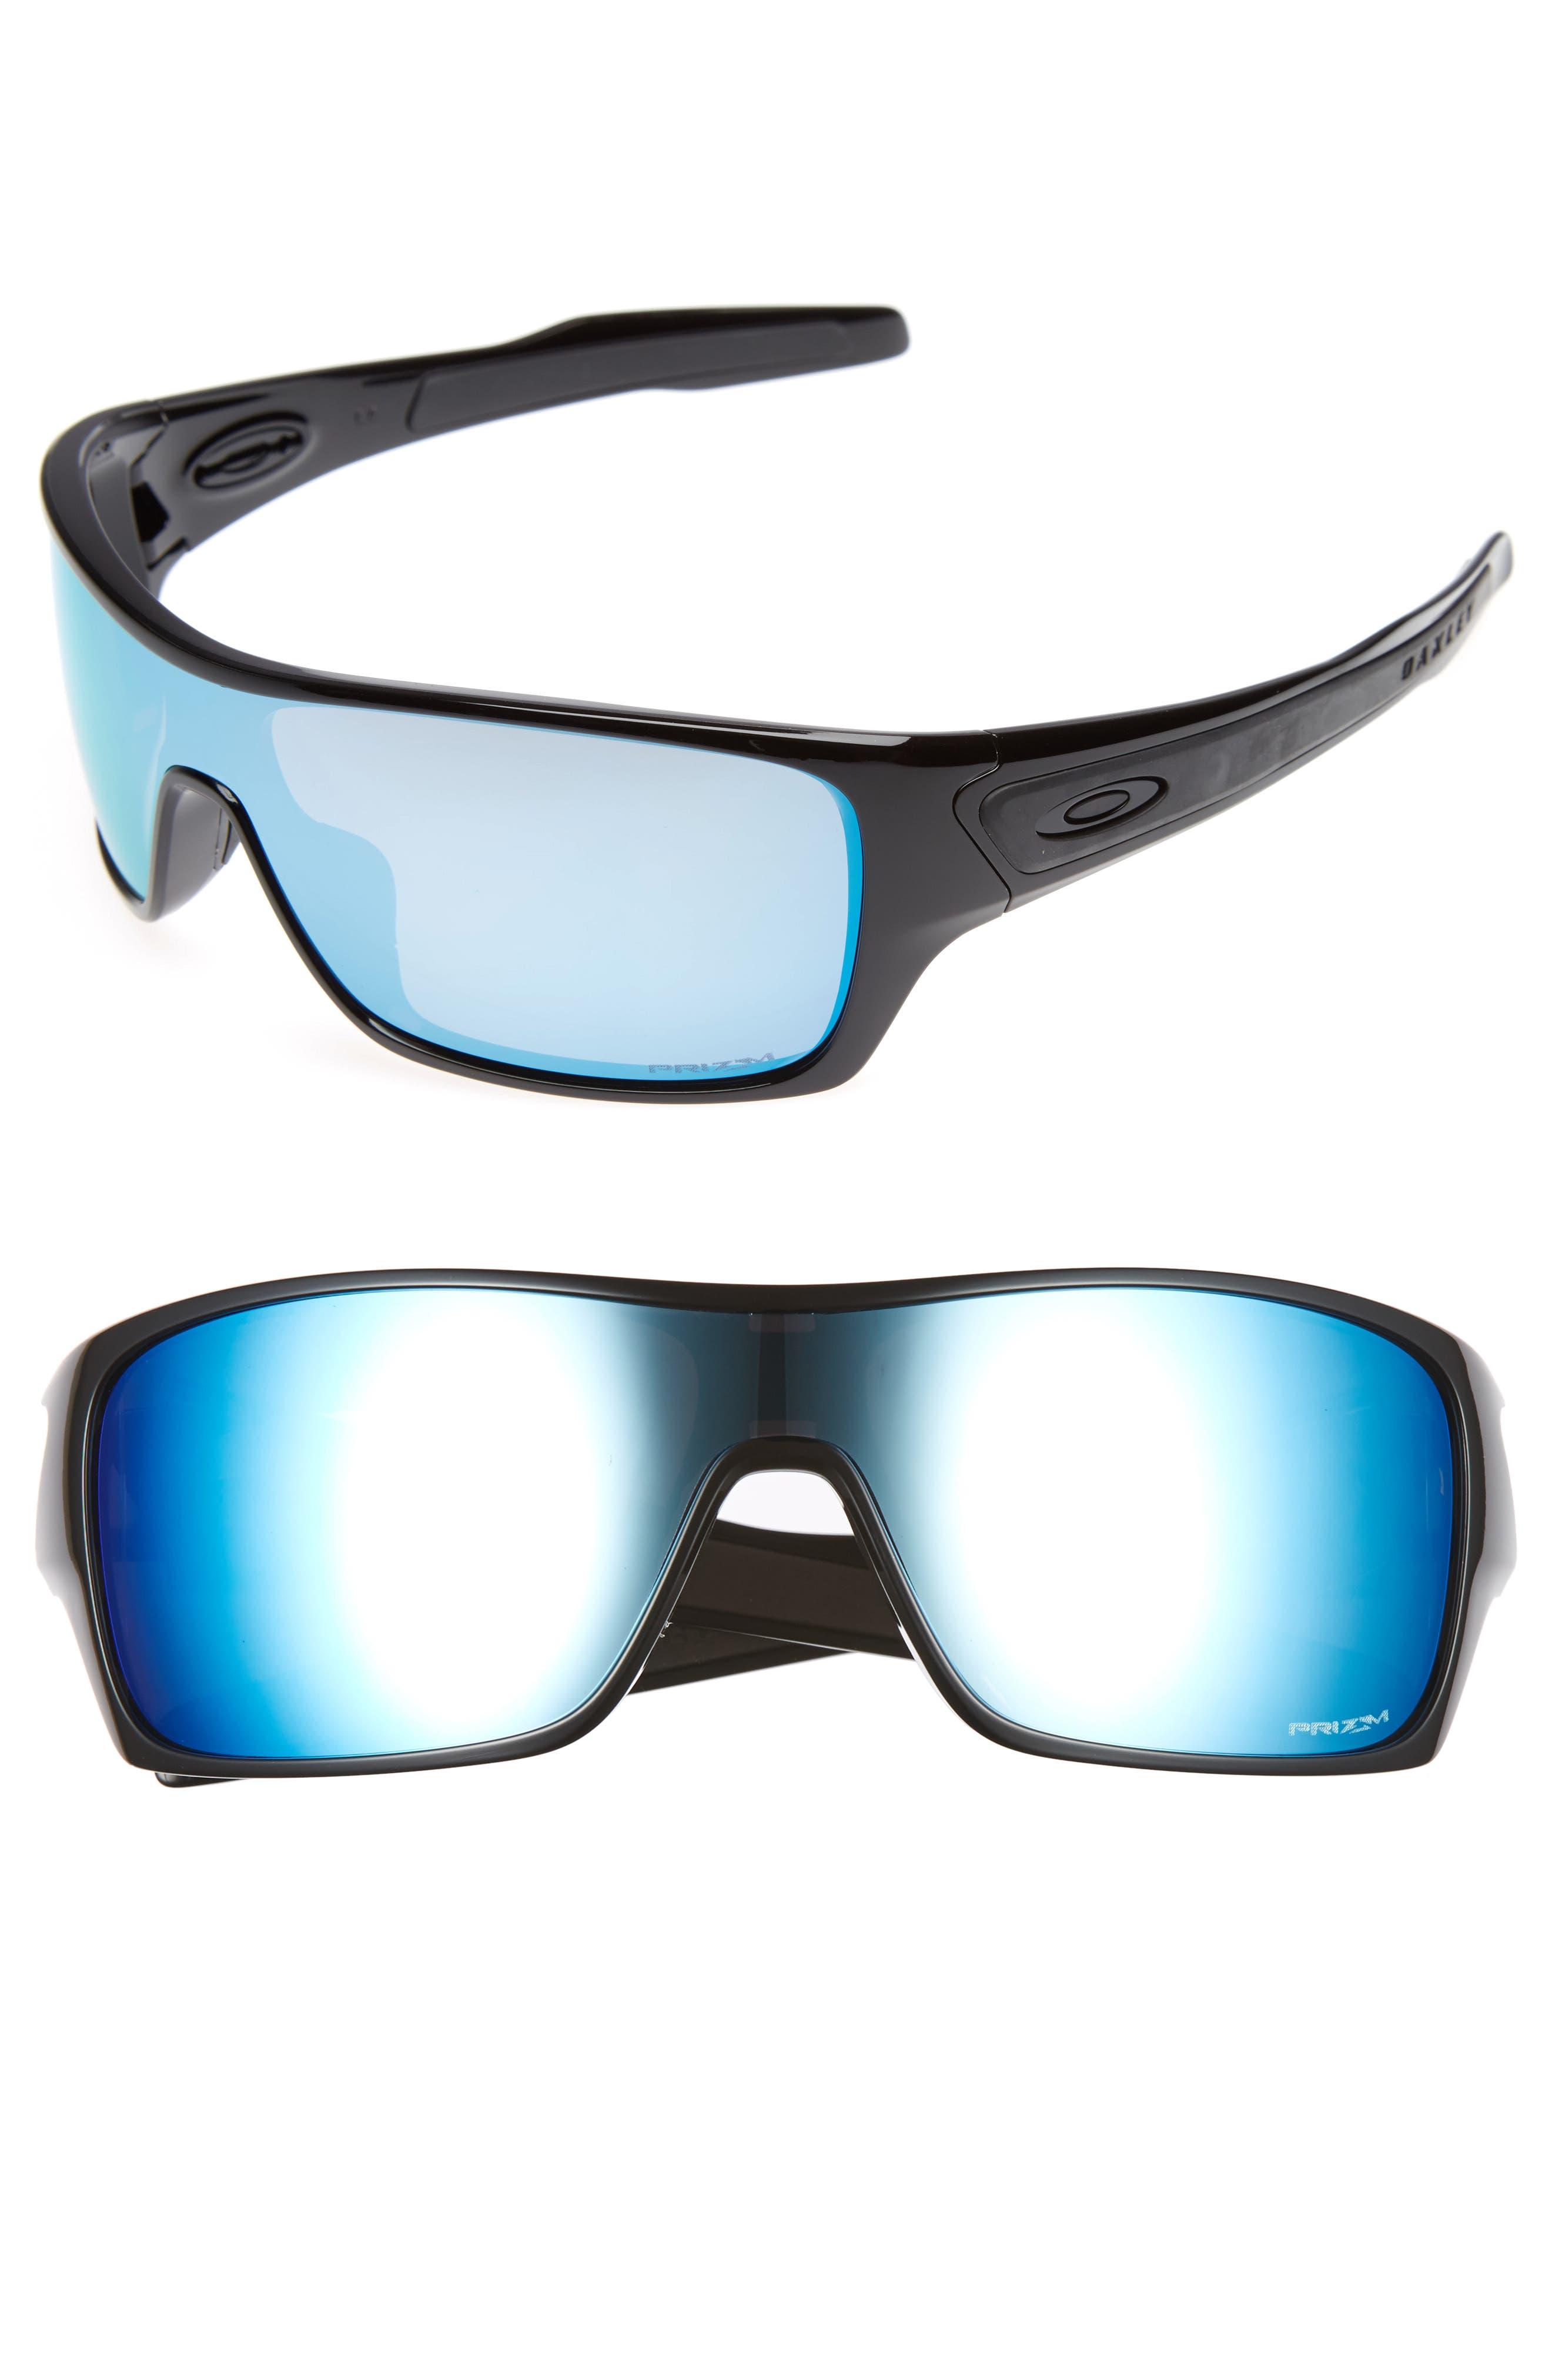 OAKLEY POLARIZED TURBINE ROTOR PRIZM DEEP WATER SUNGLASSES, OO9307, BLACK/BLUE